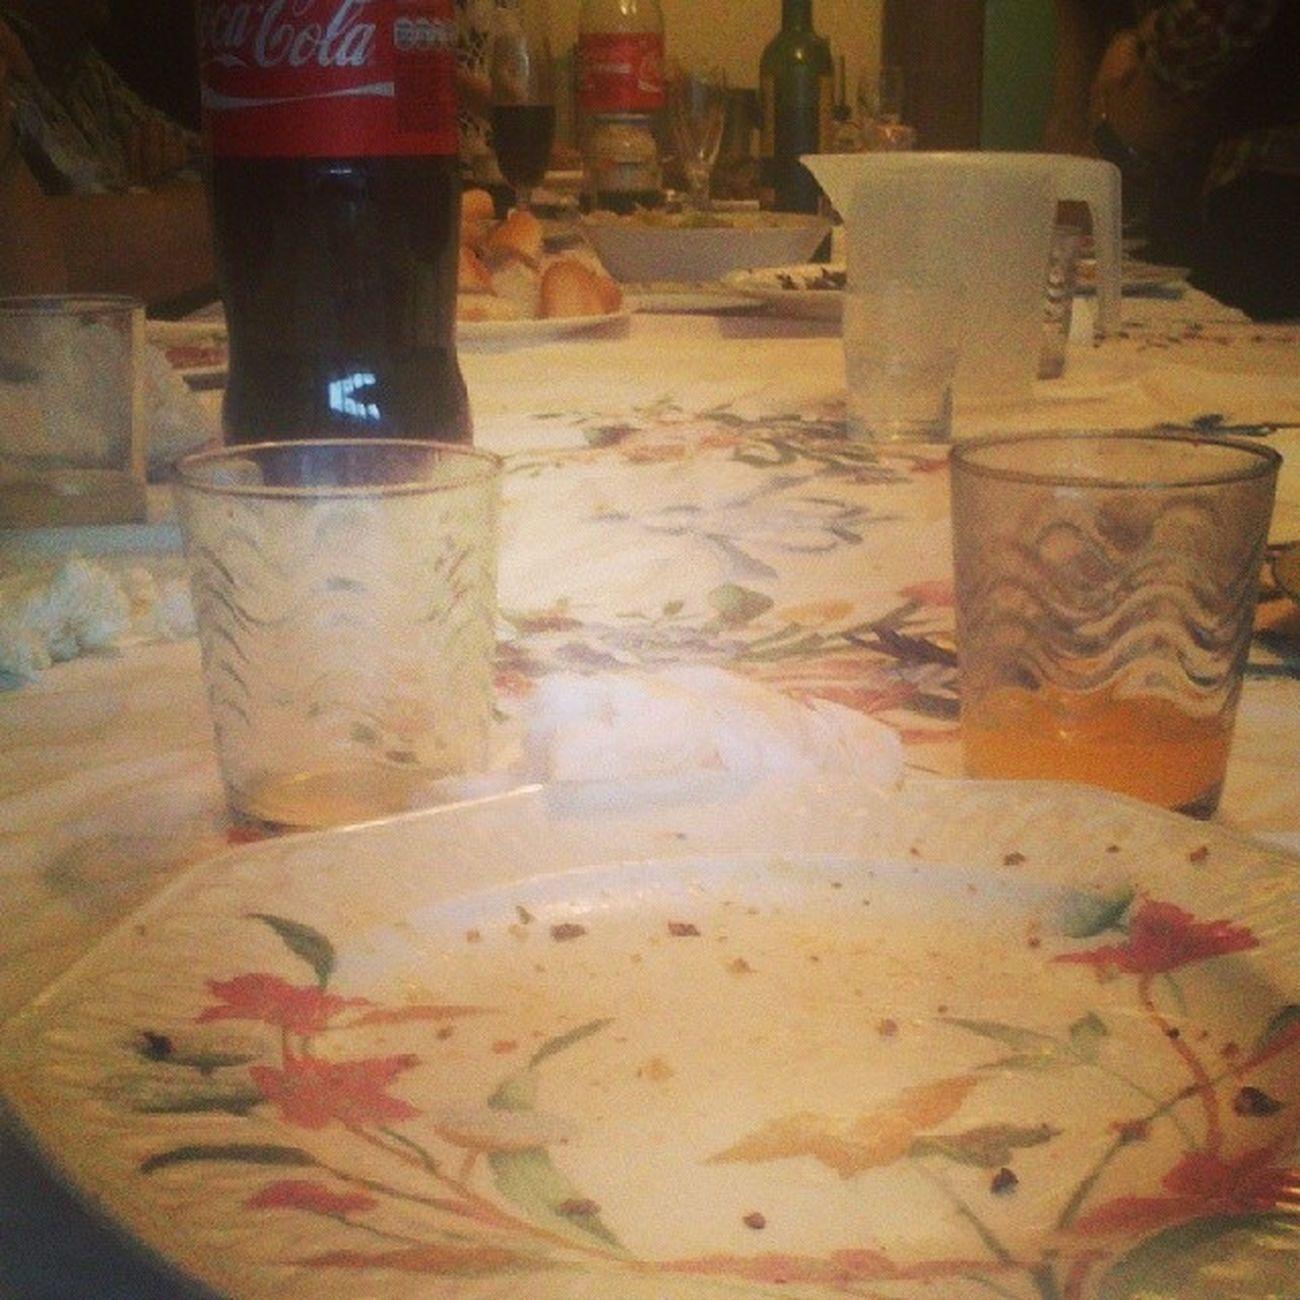 Cordero Comida Familiar Eat food comer lleno instalike instago instagram instacool instagood